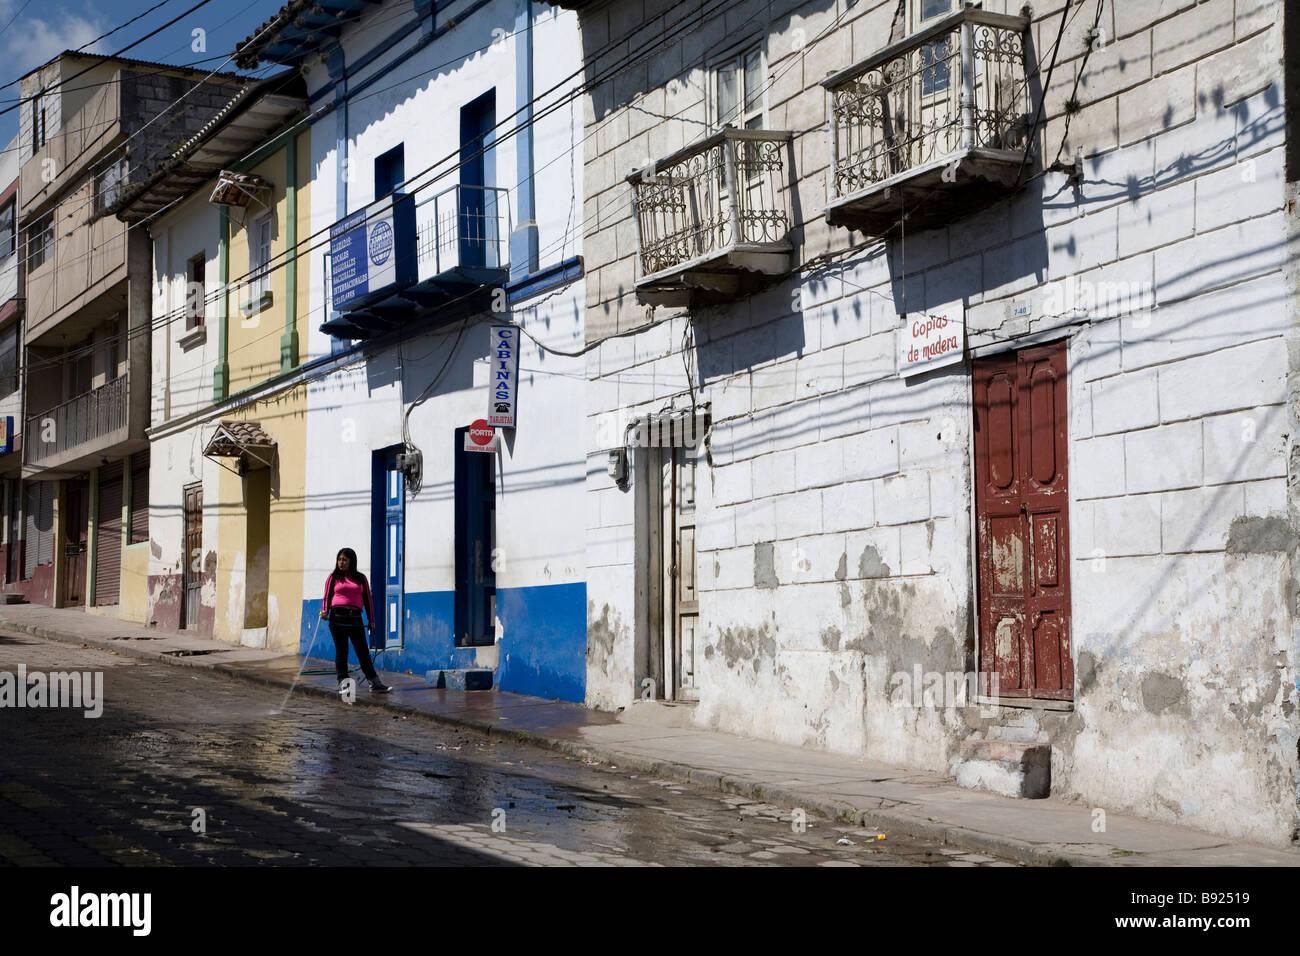 Street scene, San Antonio de Ibarra, Otavalo Province, Ecuador - Stock Image